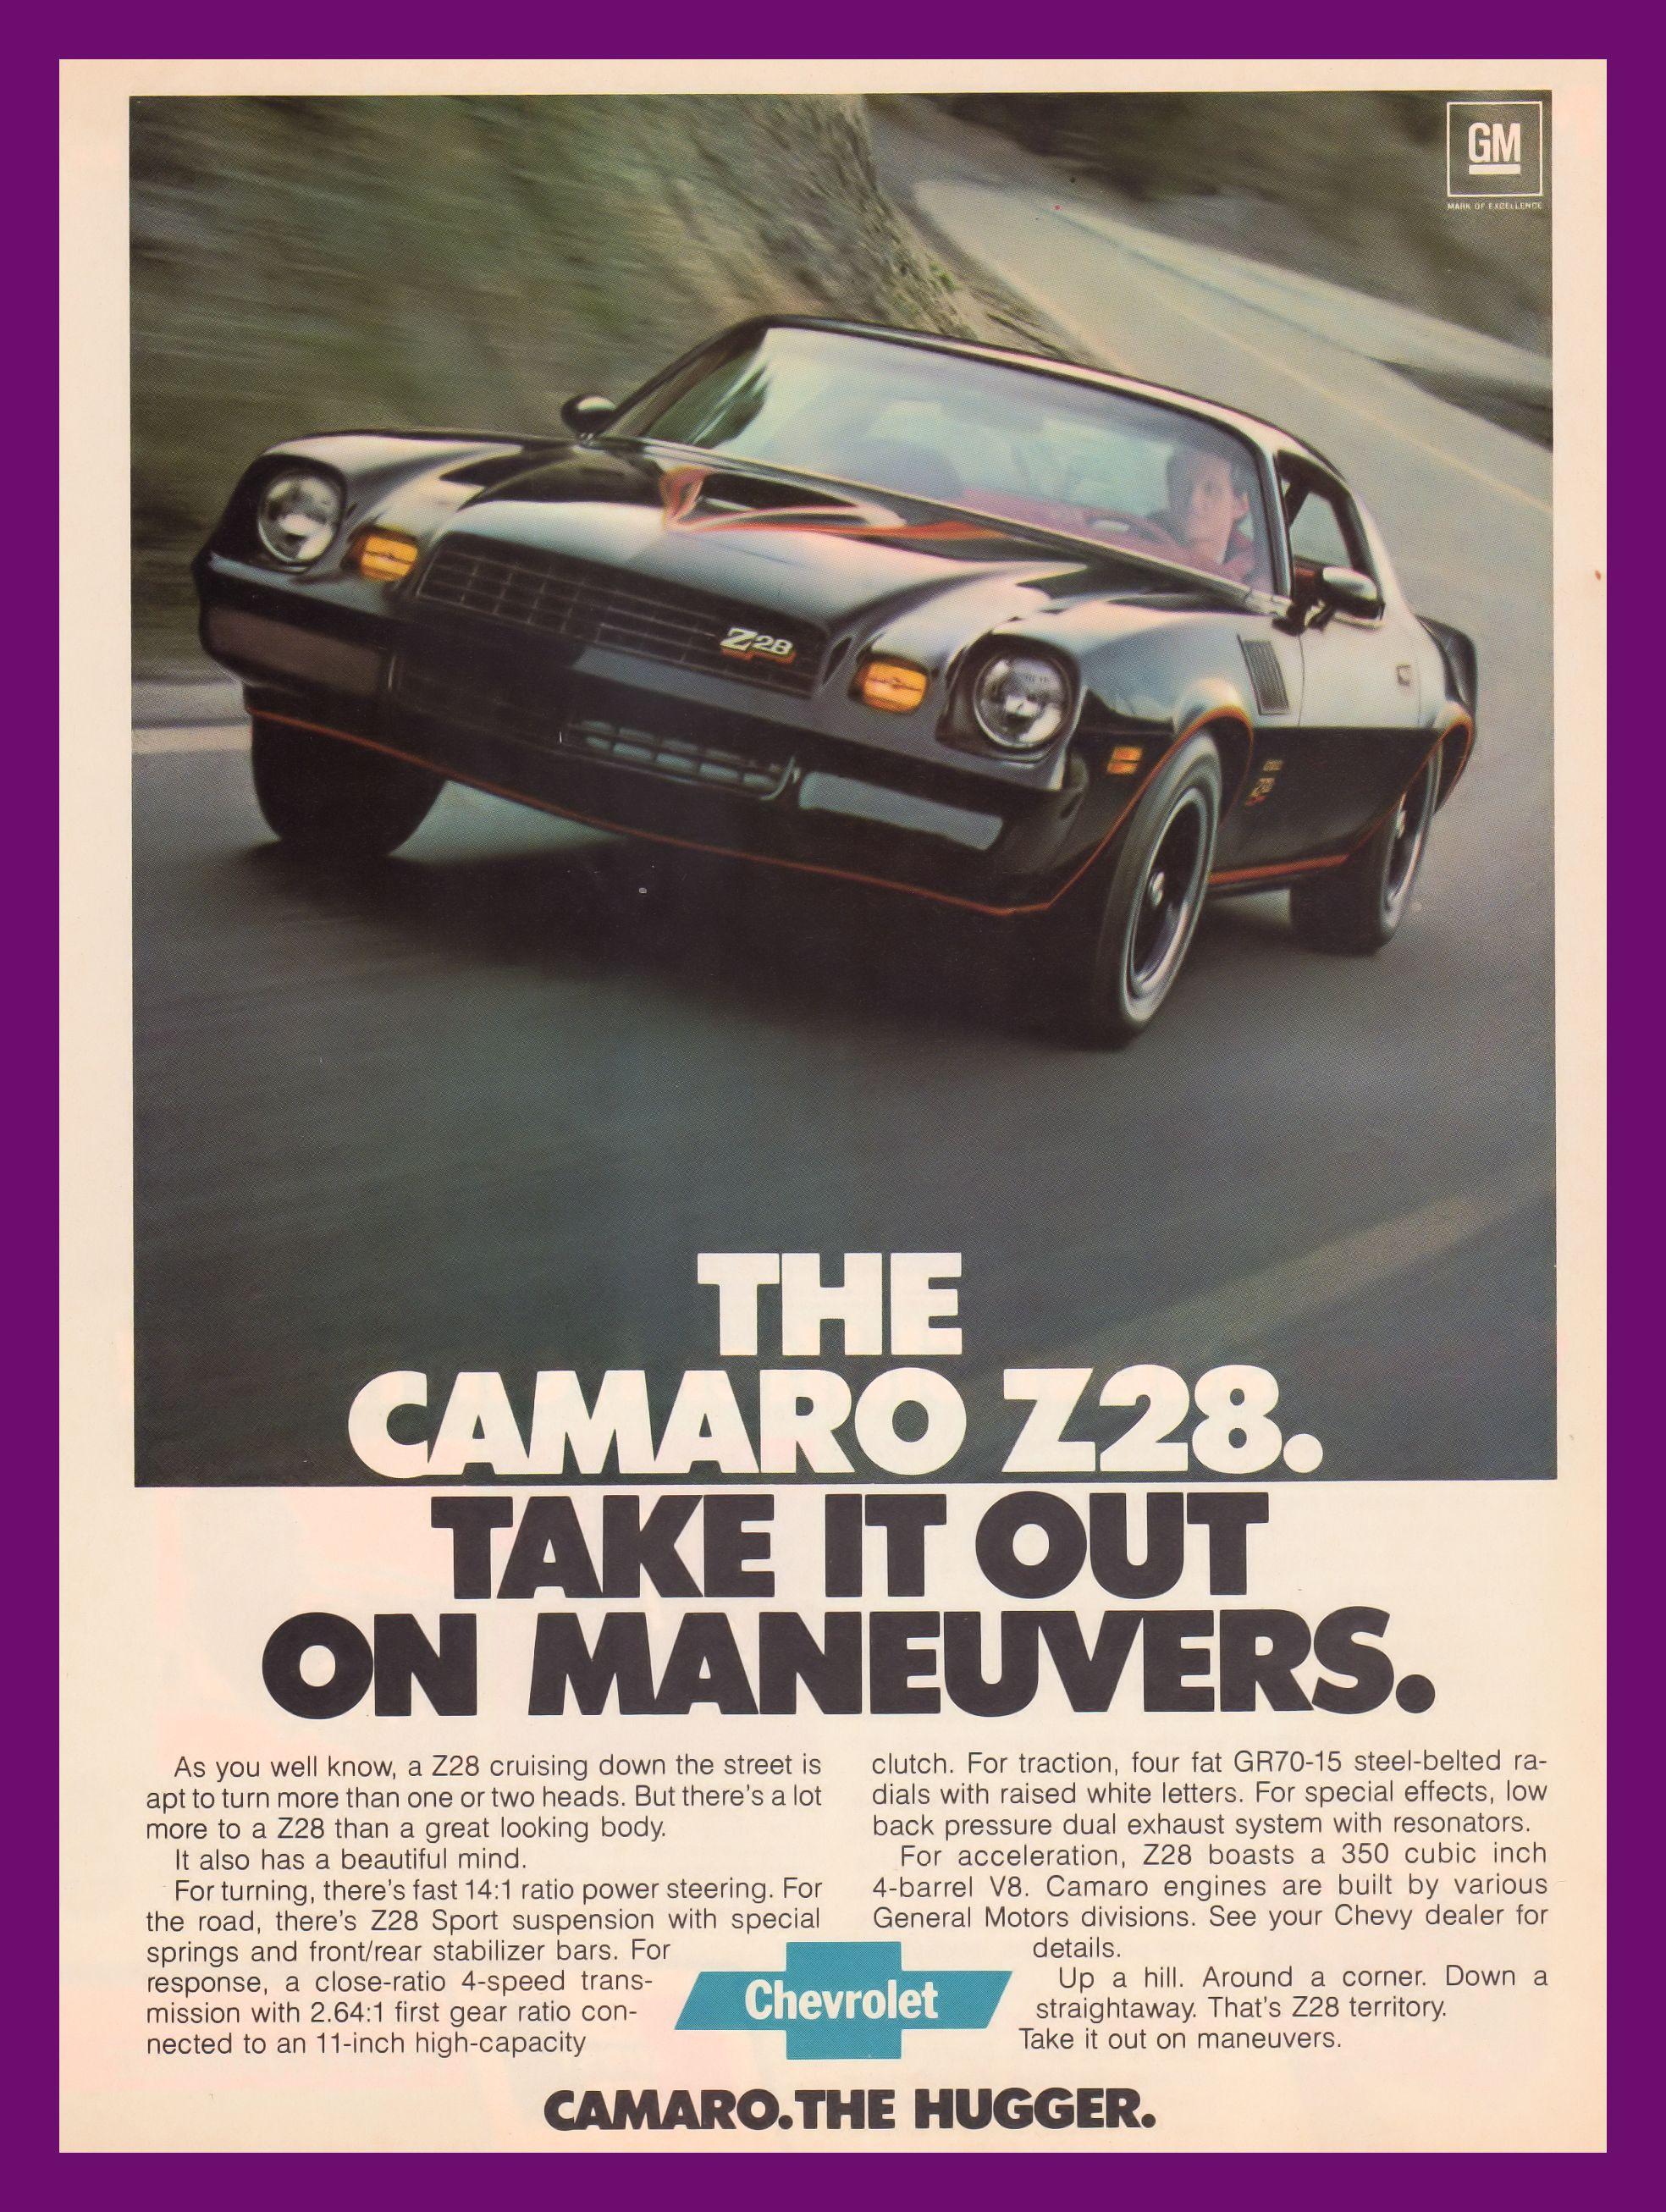 1978 Chevrolet Camaro Z28 Take It On Maneuvers Vintage Ad Brochure